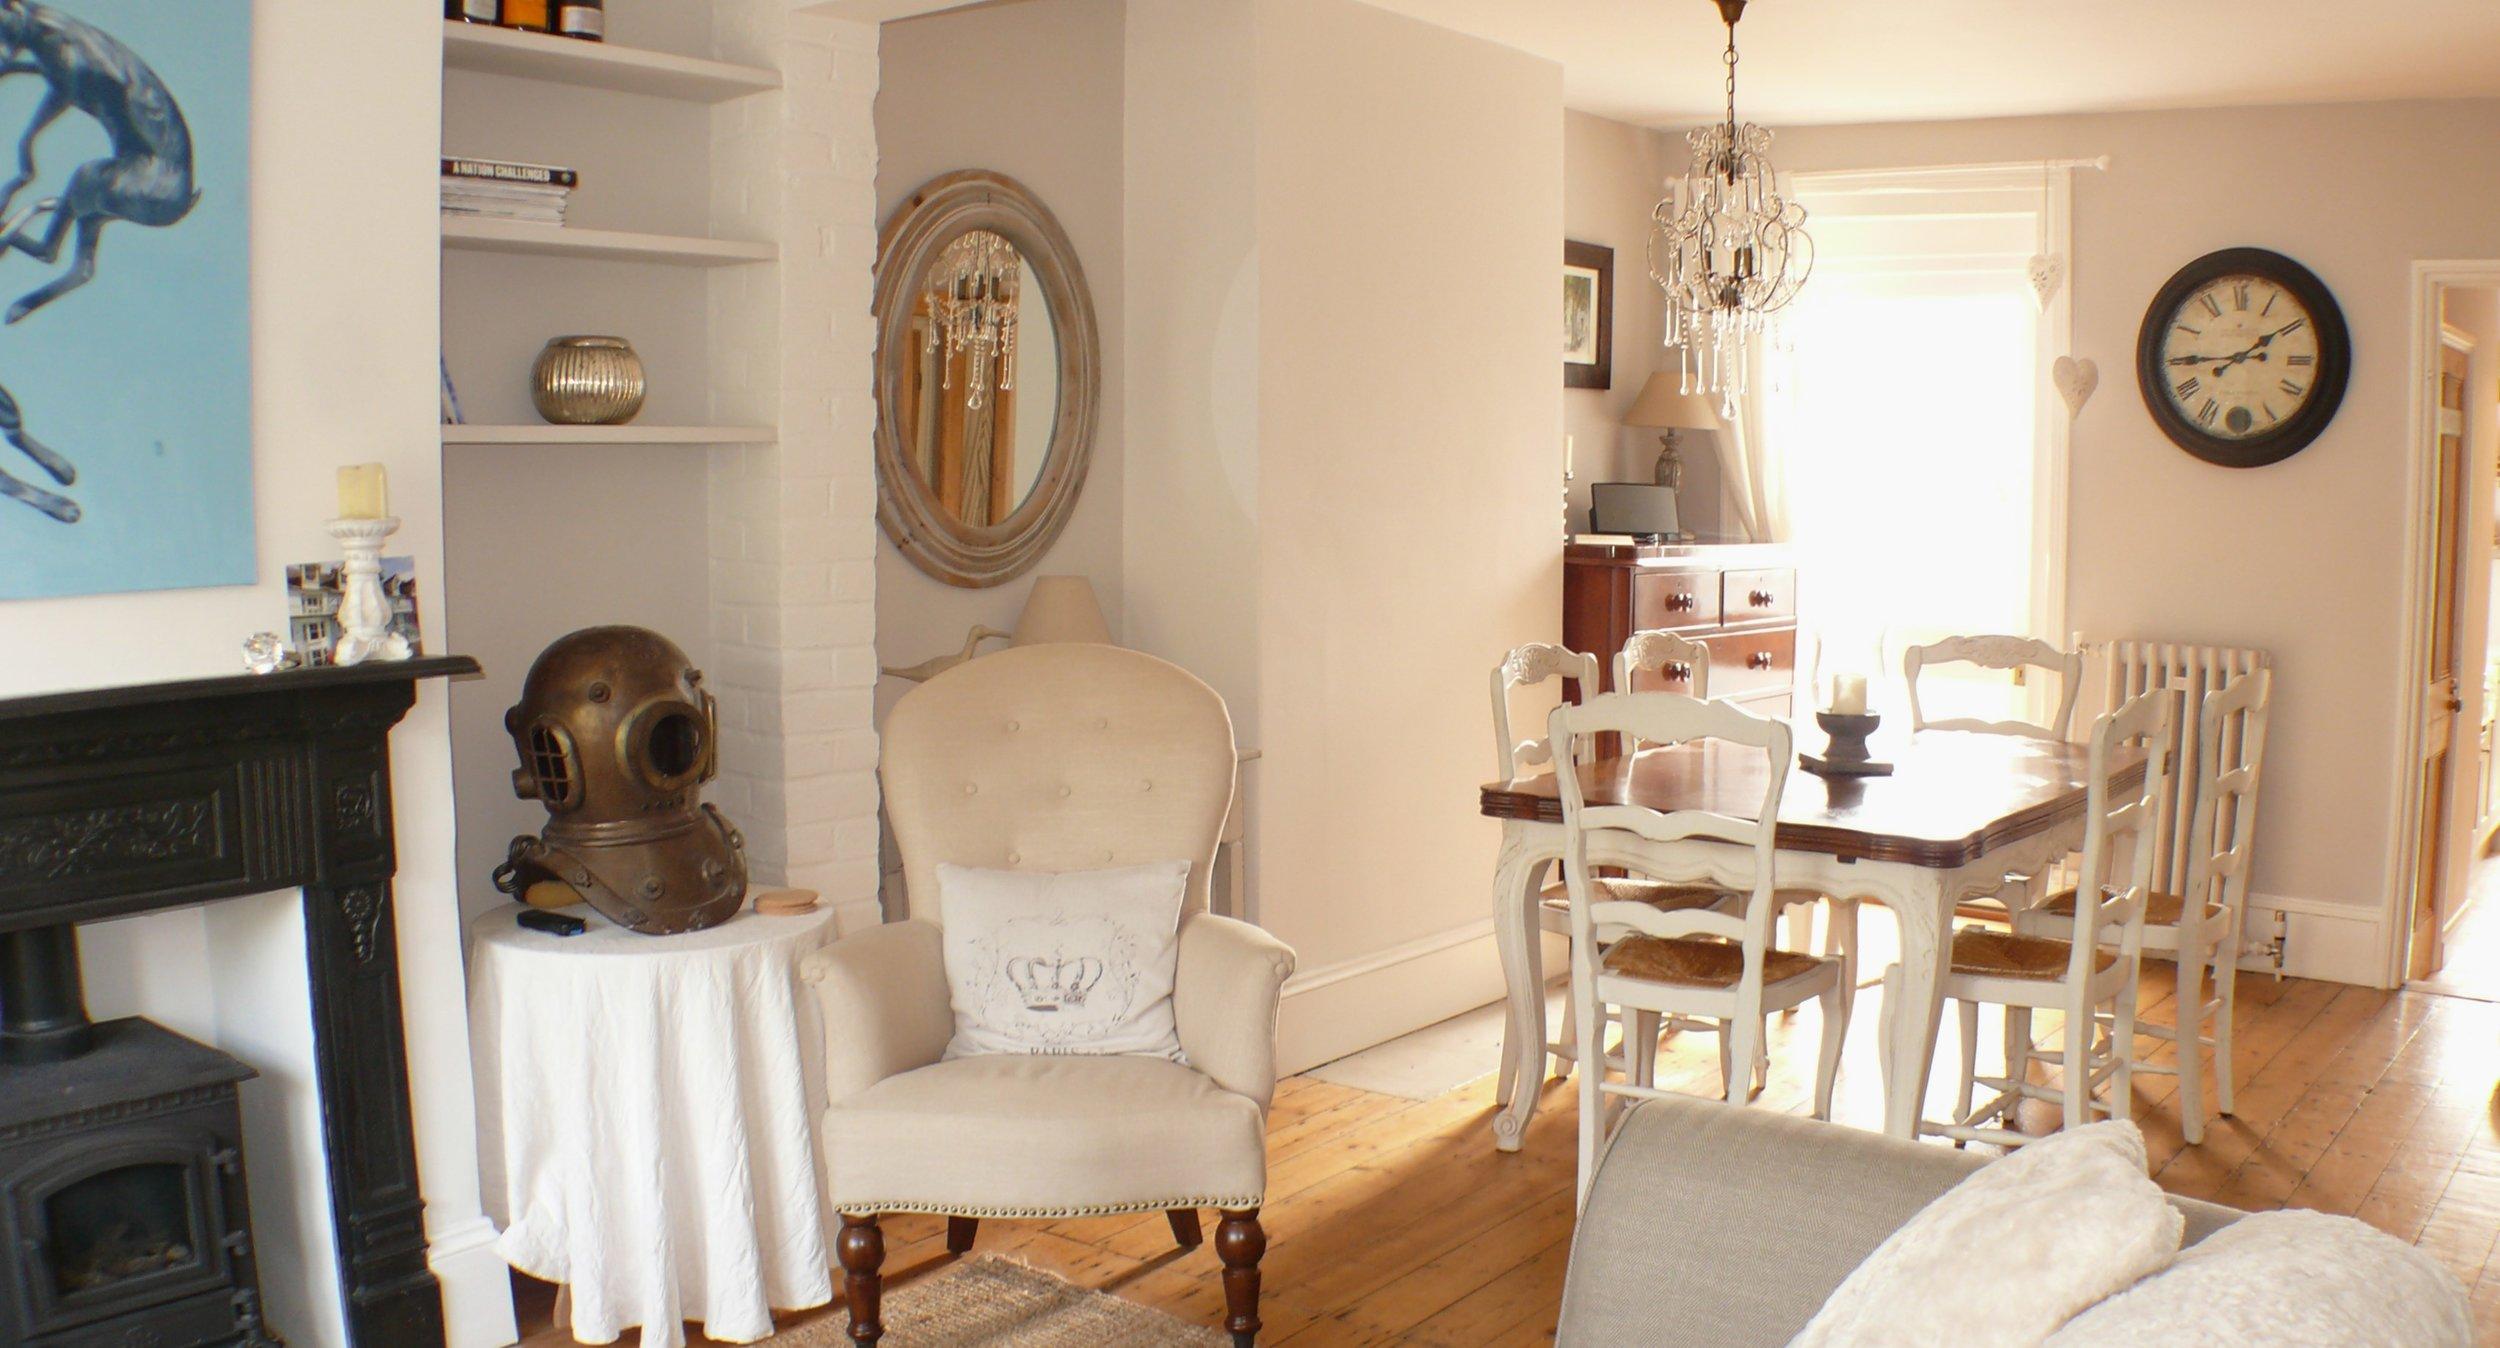 Bub lounge 2.jpg